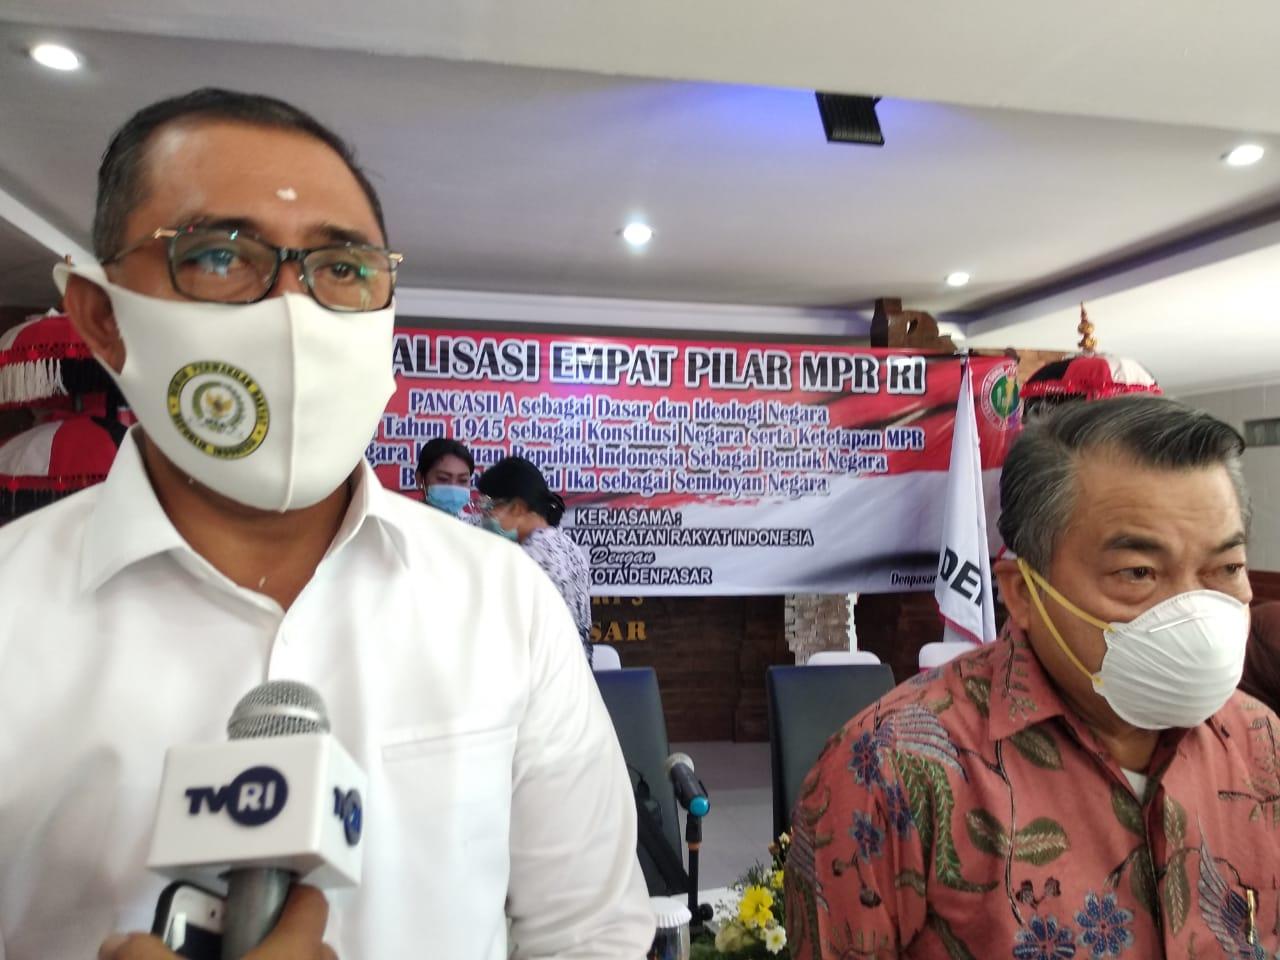 Pancasila Harga Mati, Gus Adhi Terus Kokohkan Empat Pilar Kebangsaan Di Pulau Dewata